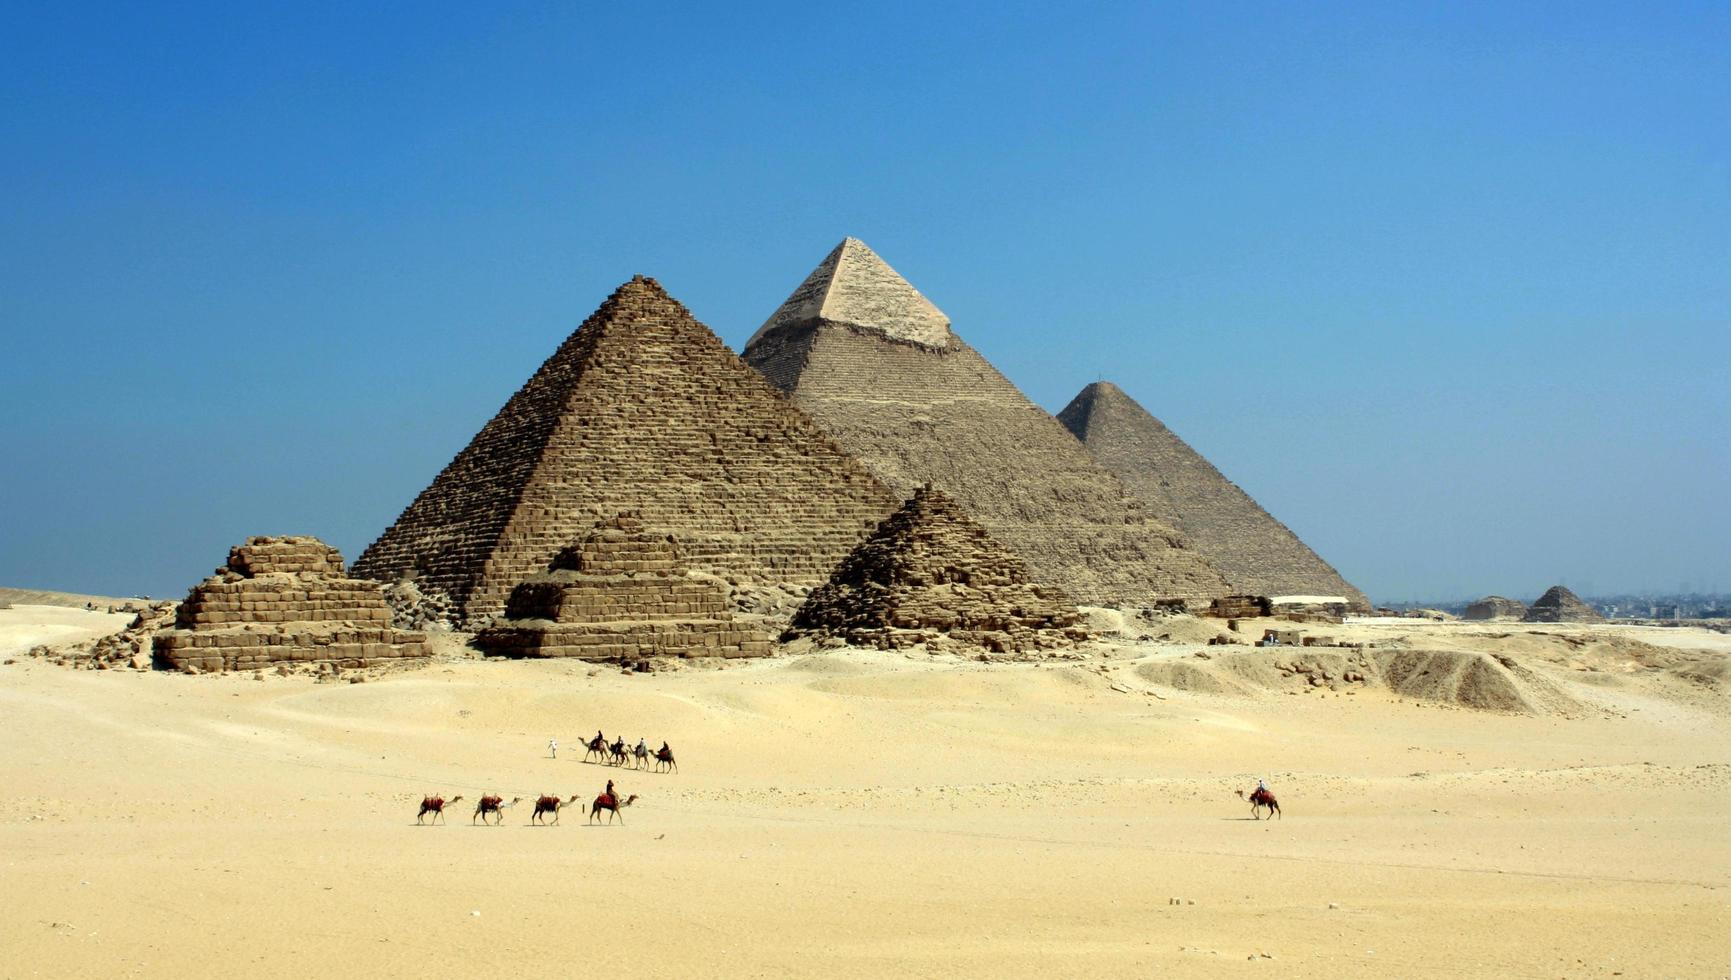 The Pyramids of Giza photo